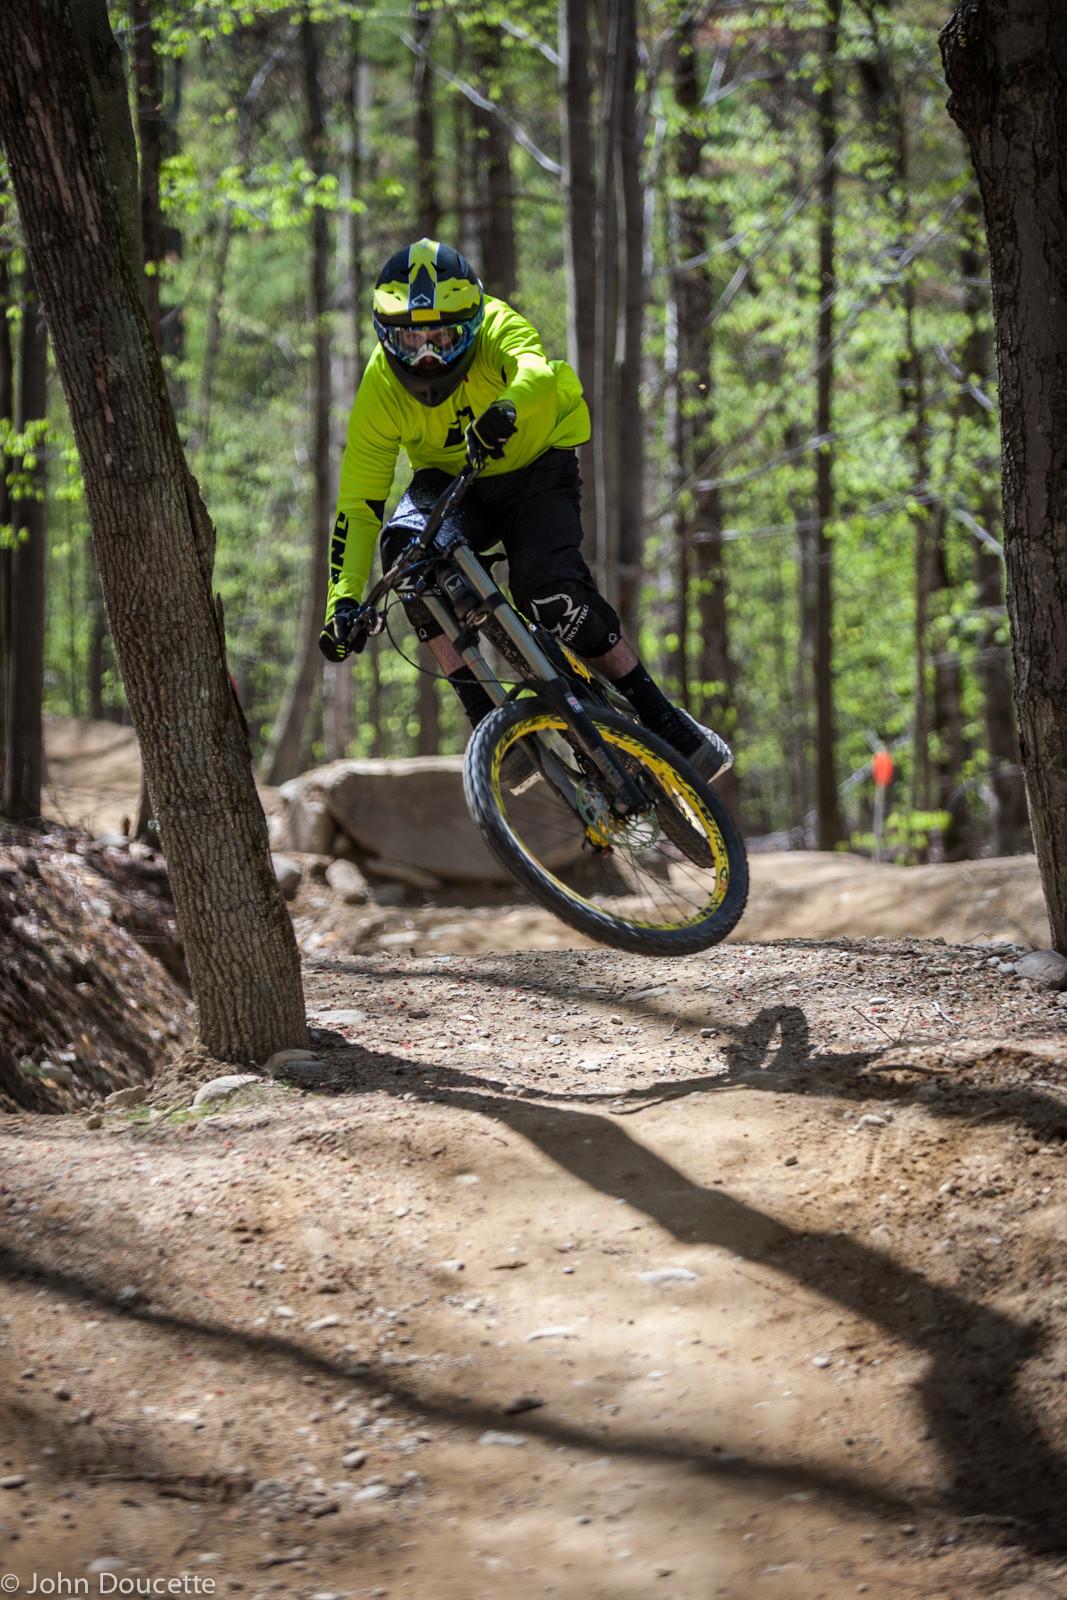 Dave Smutok - Highland Mountain Opening Weekend - Mountain Biking Pictures - Vital MTB